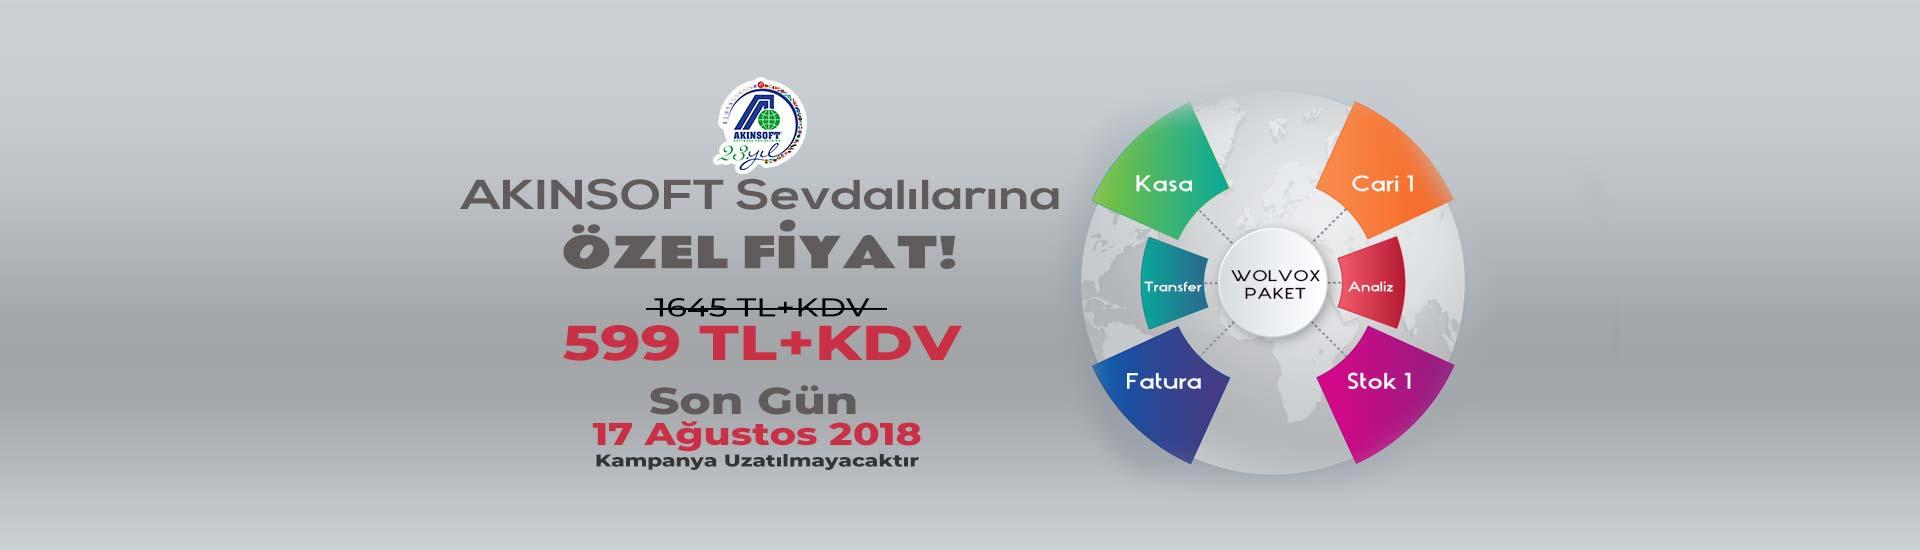 AKINSOFT Sevdalılarına Özel WOLVOX Paket1 599 TL + KDV